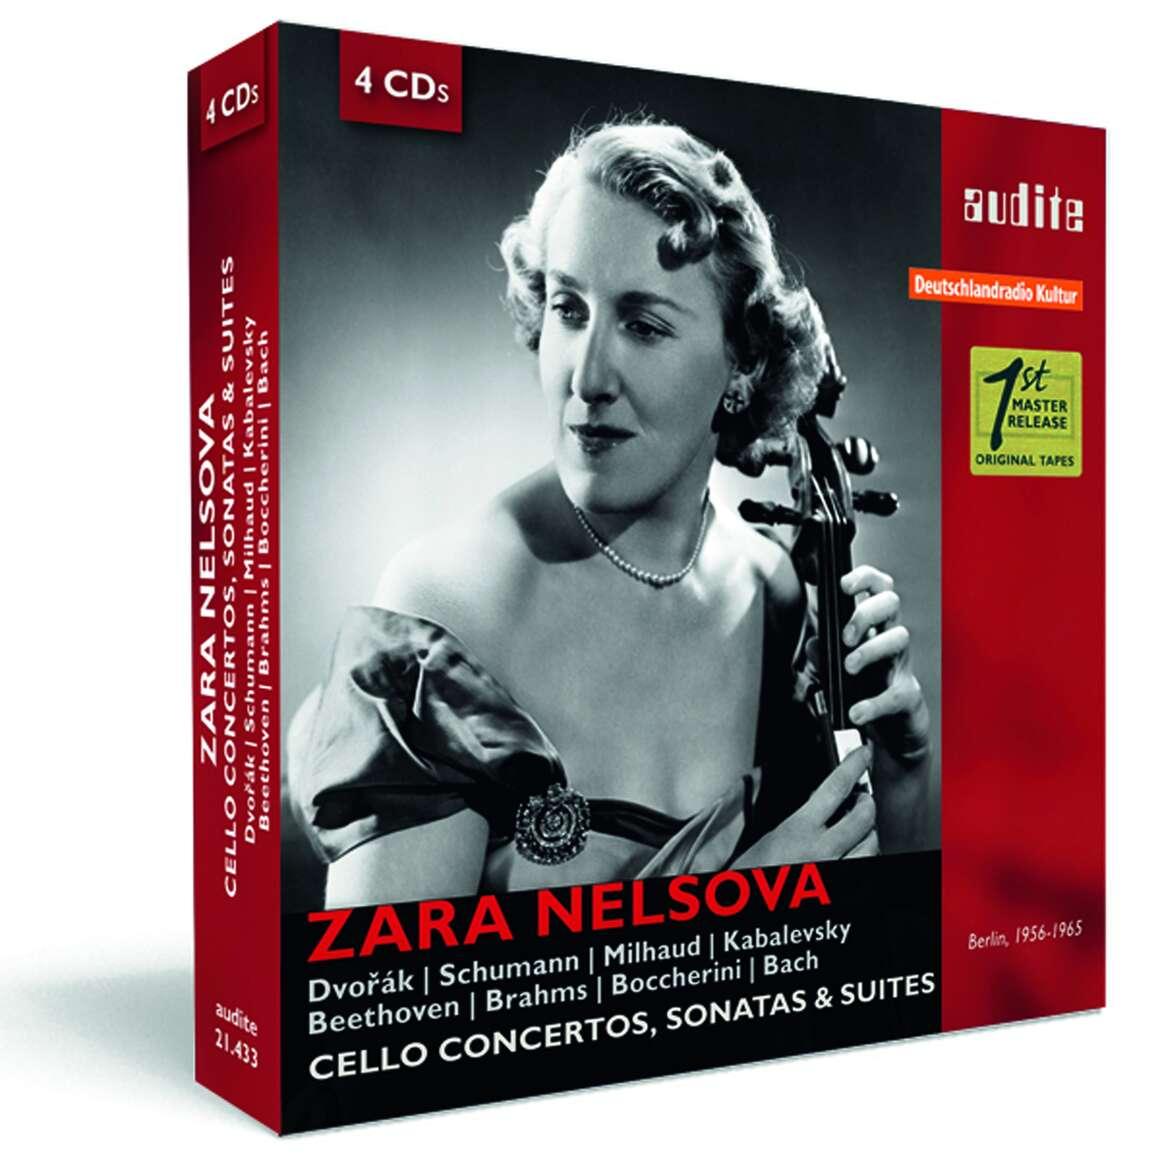 Portrait Zara Nelsova